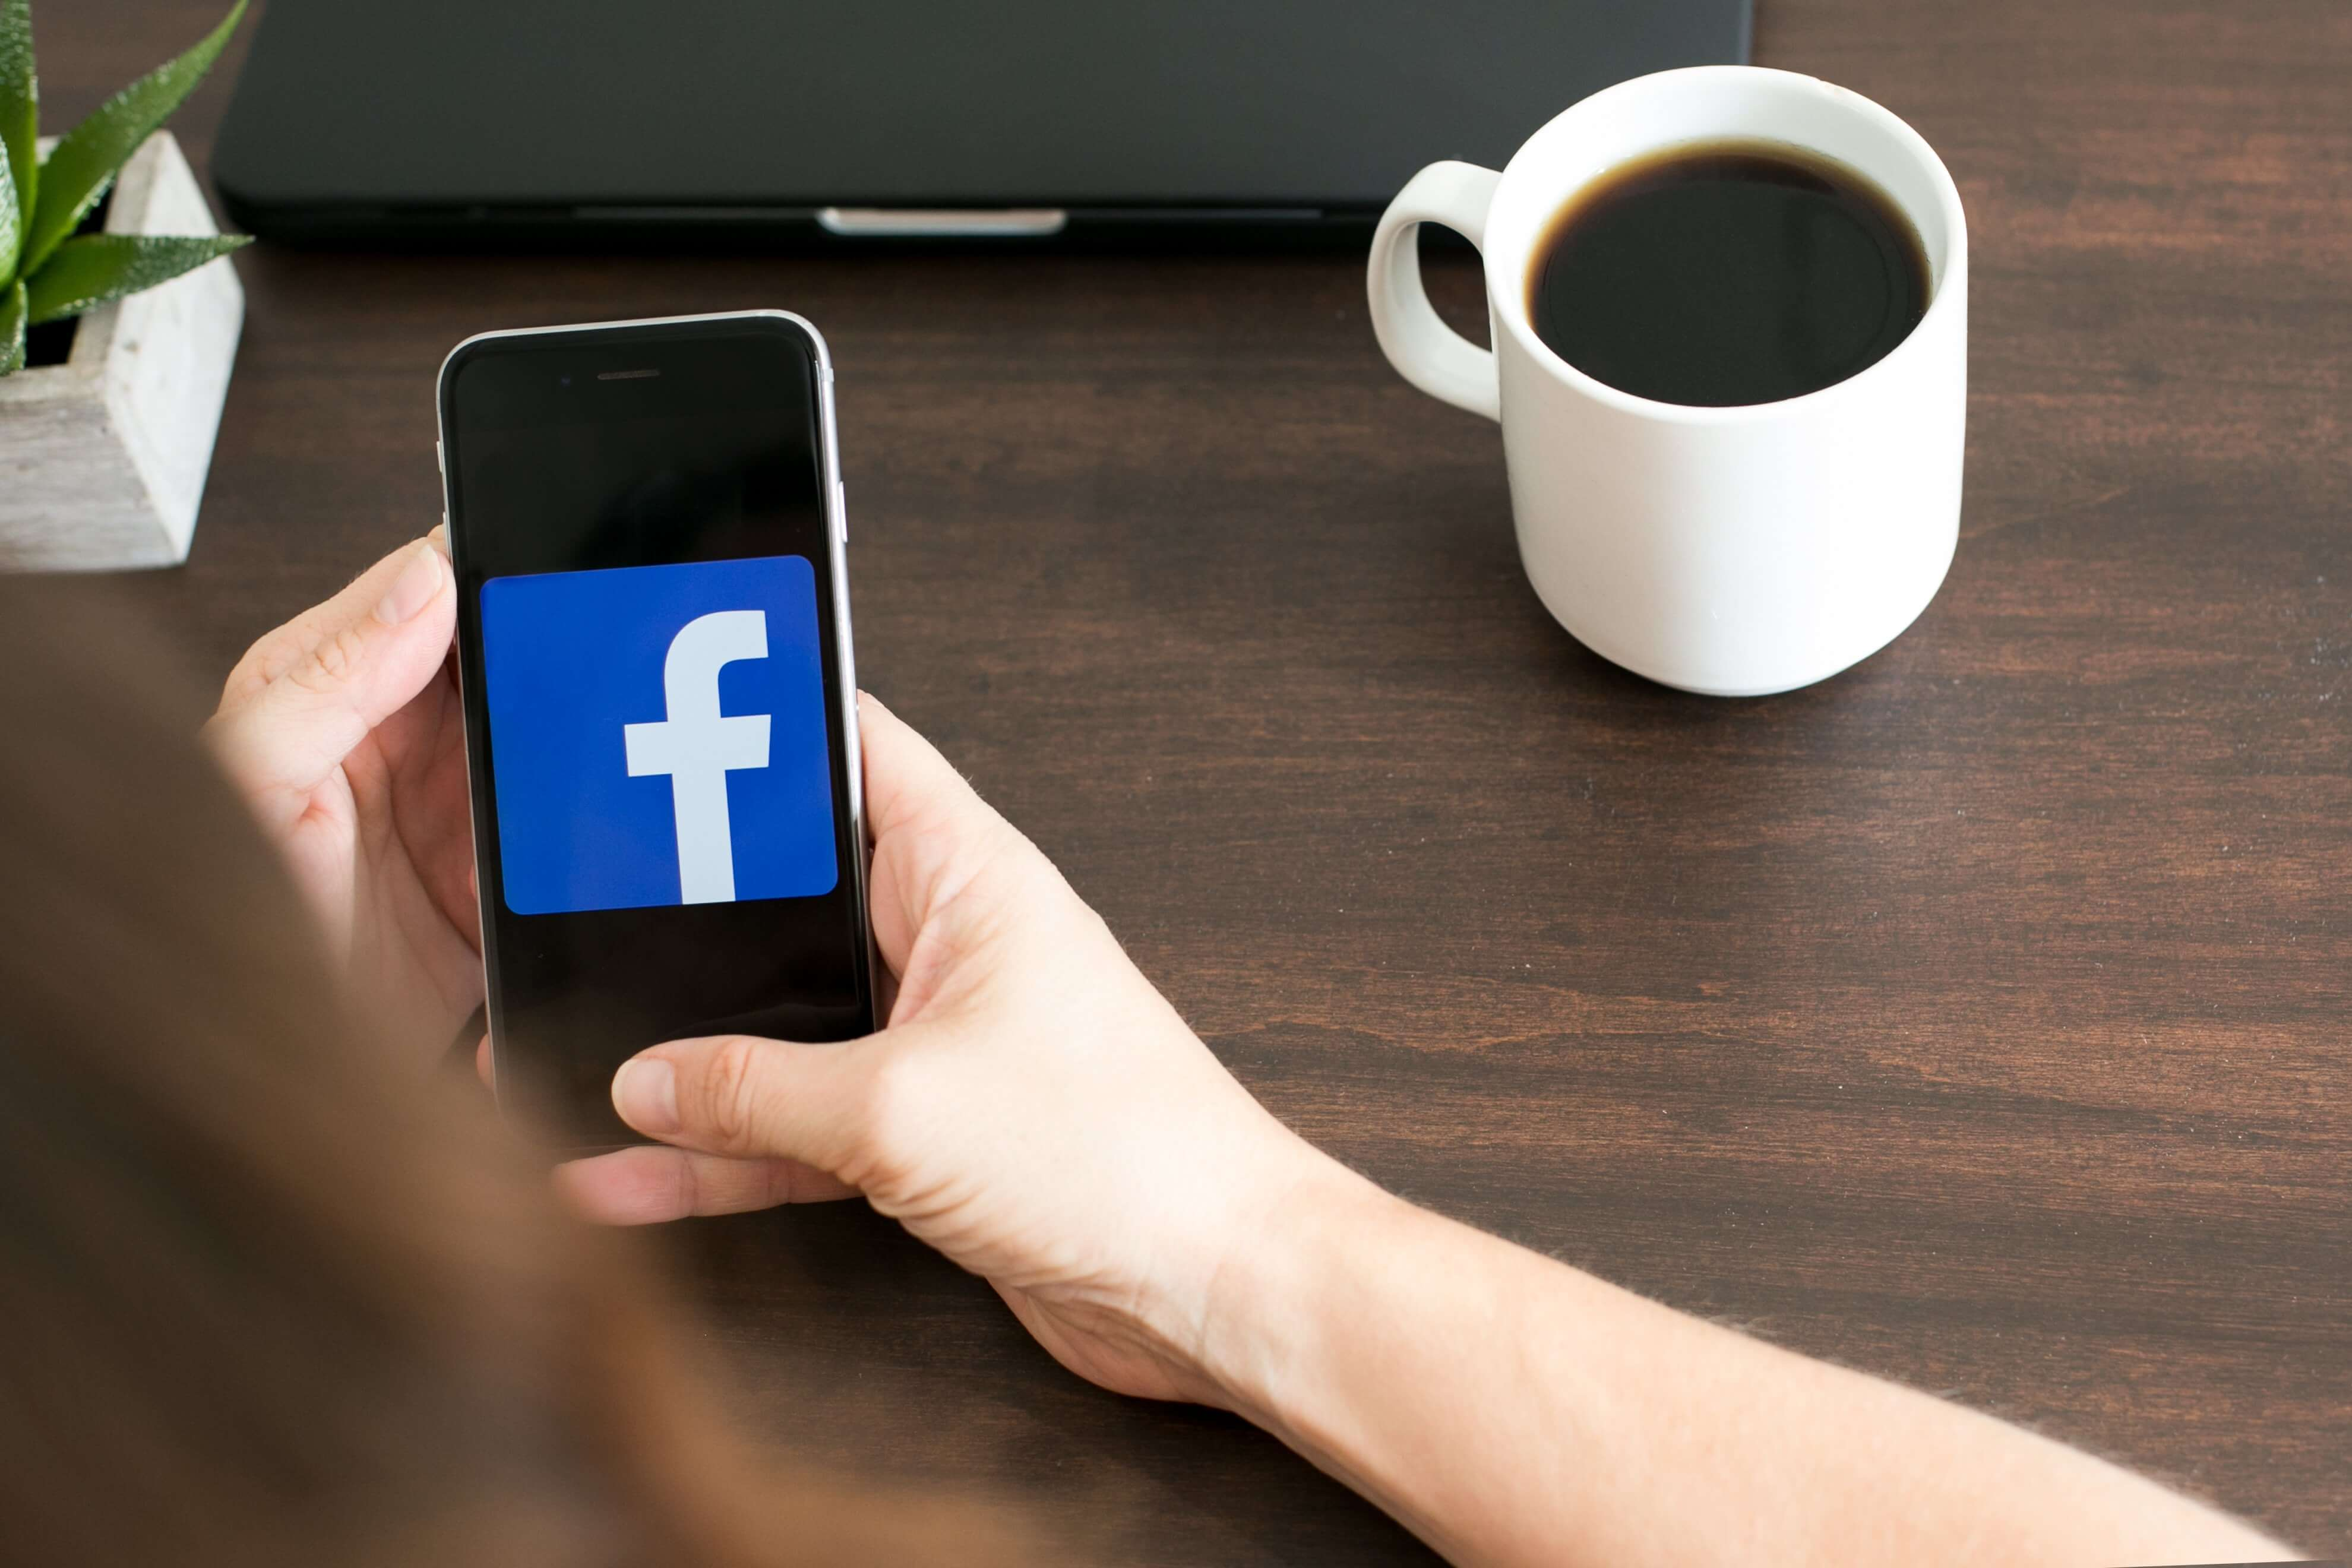 Social Media trends 2021 GraphicMama: Social Media Usage by Gender